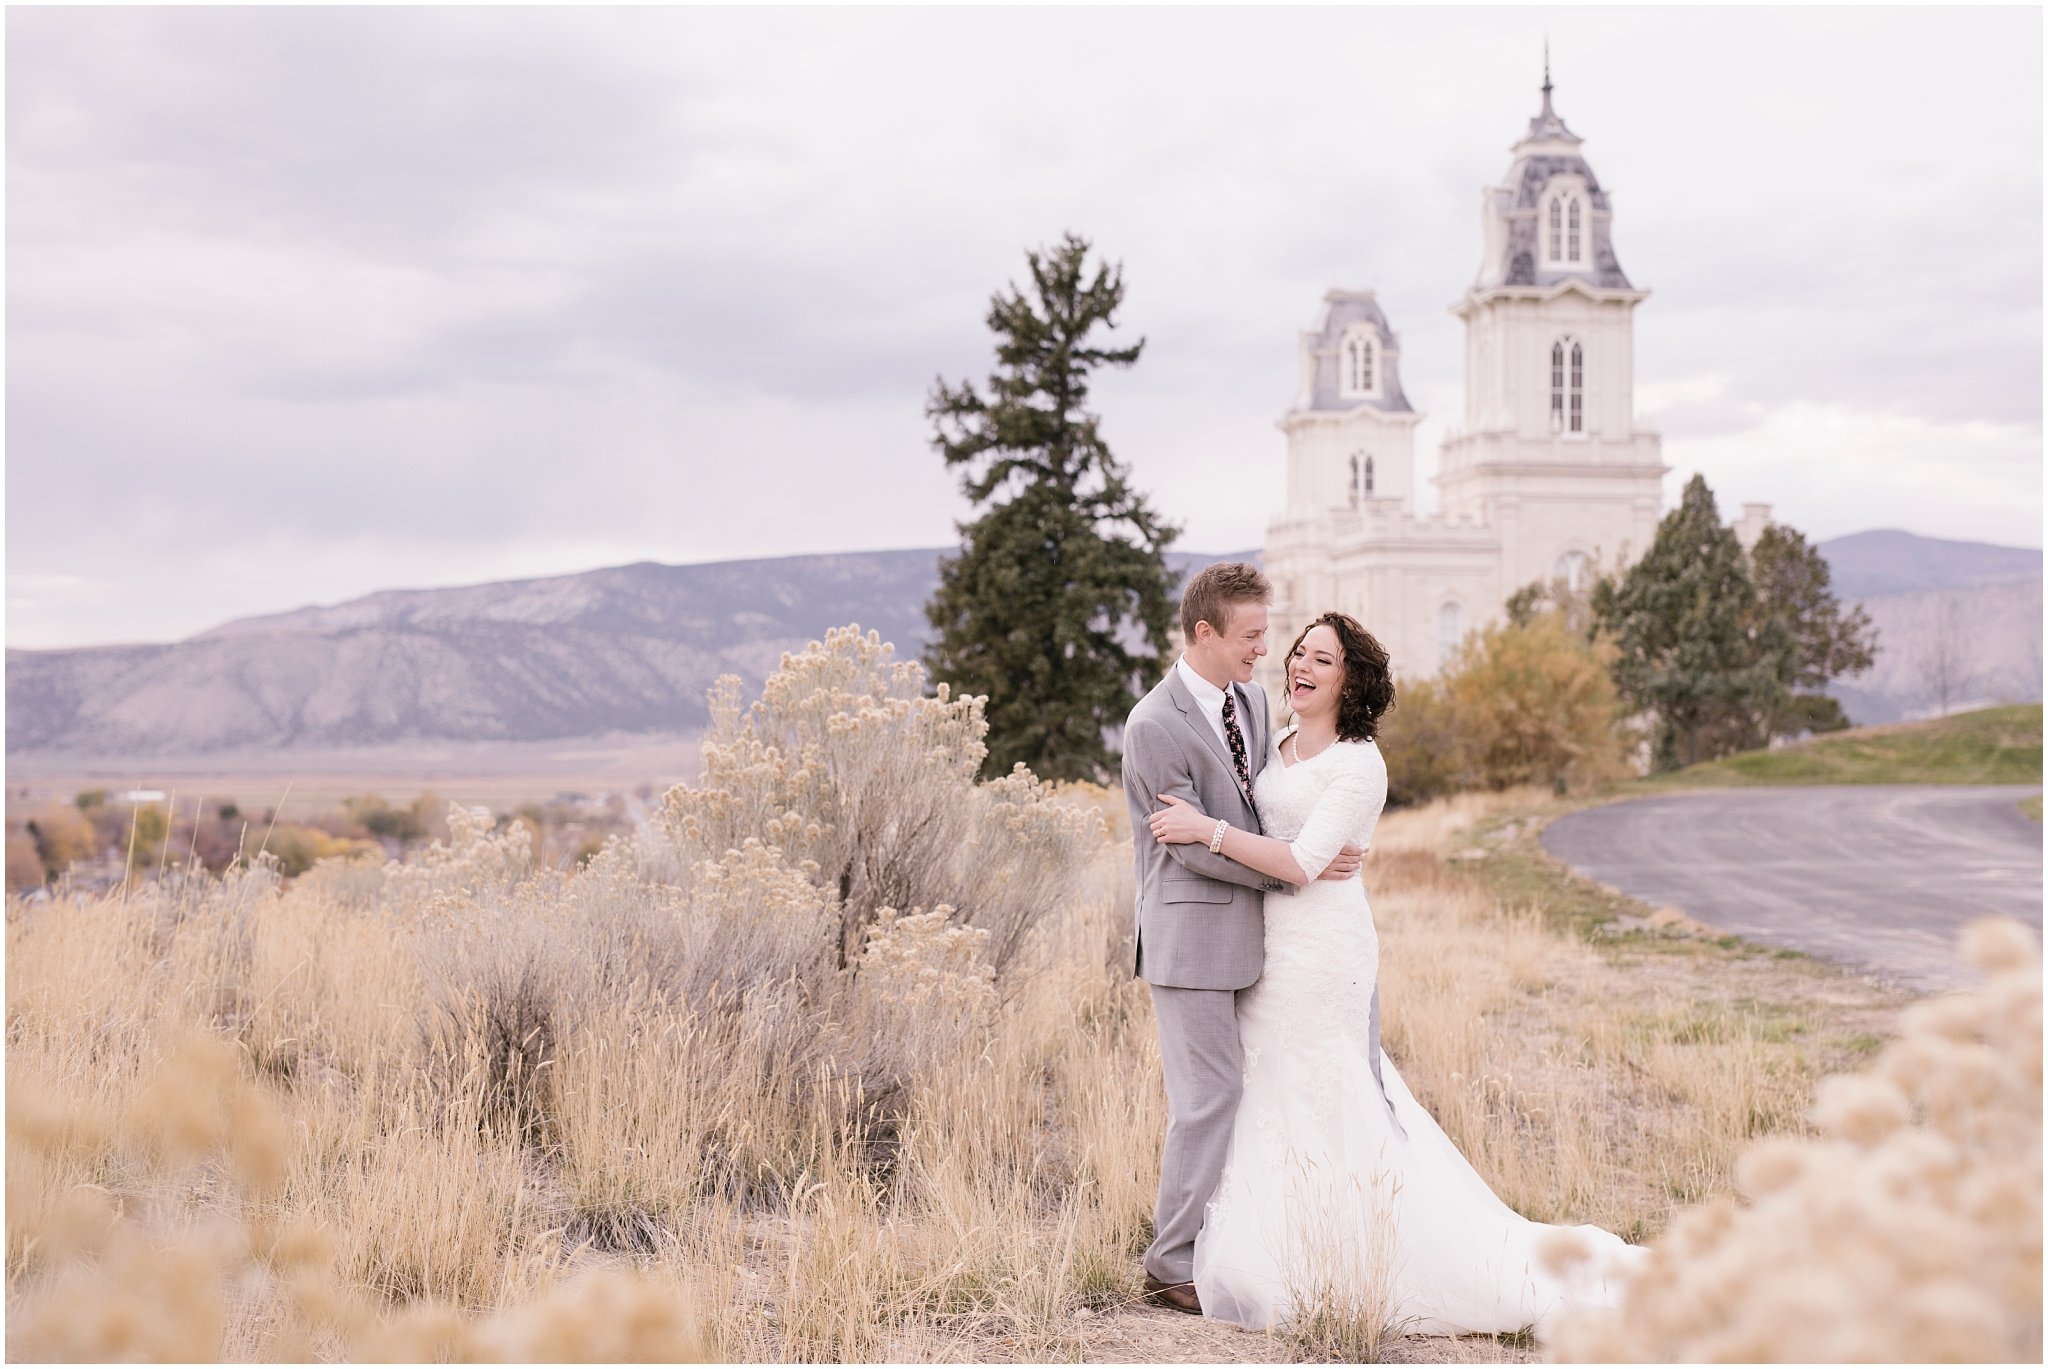 BA-Bridals-64_Lizzie-B-Imagery-Utah-Wedding-Photographer-Central-Utah-Photographer-Utah-County-Manti-Utah-Temple.jpg